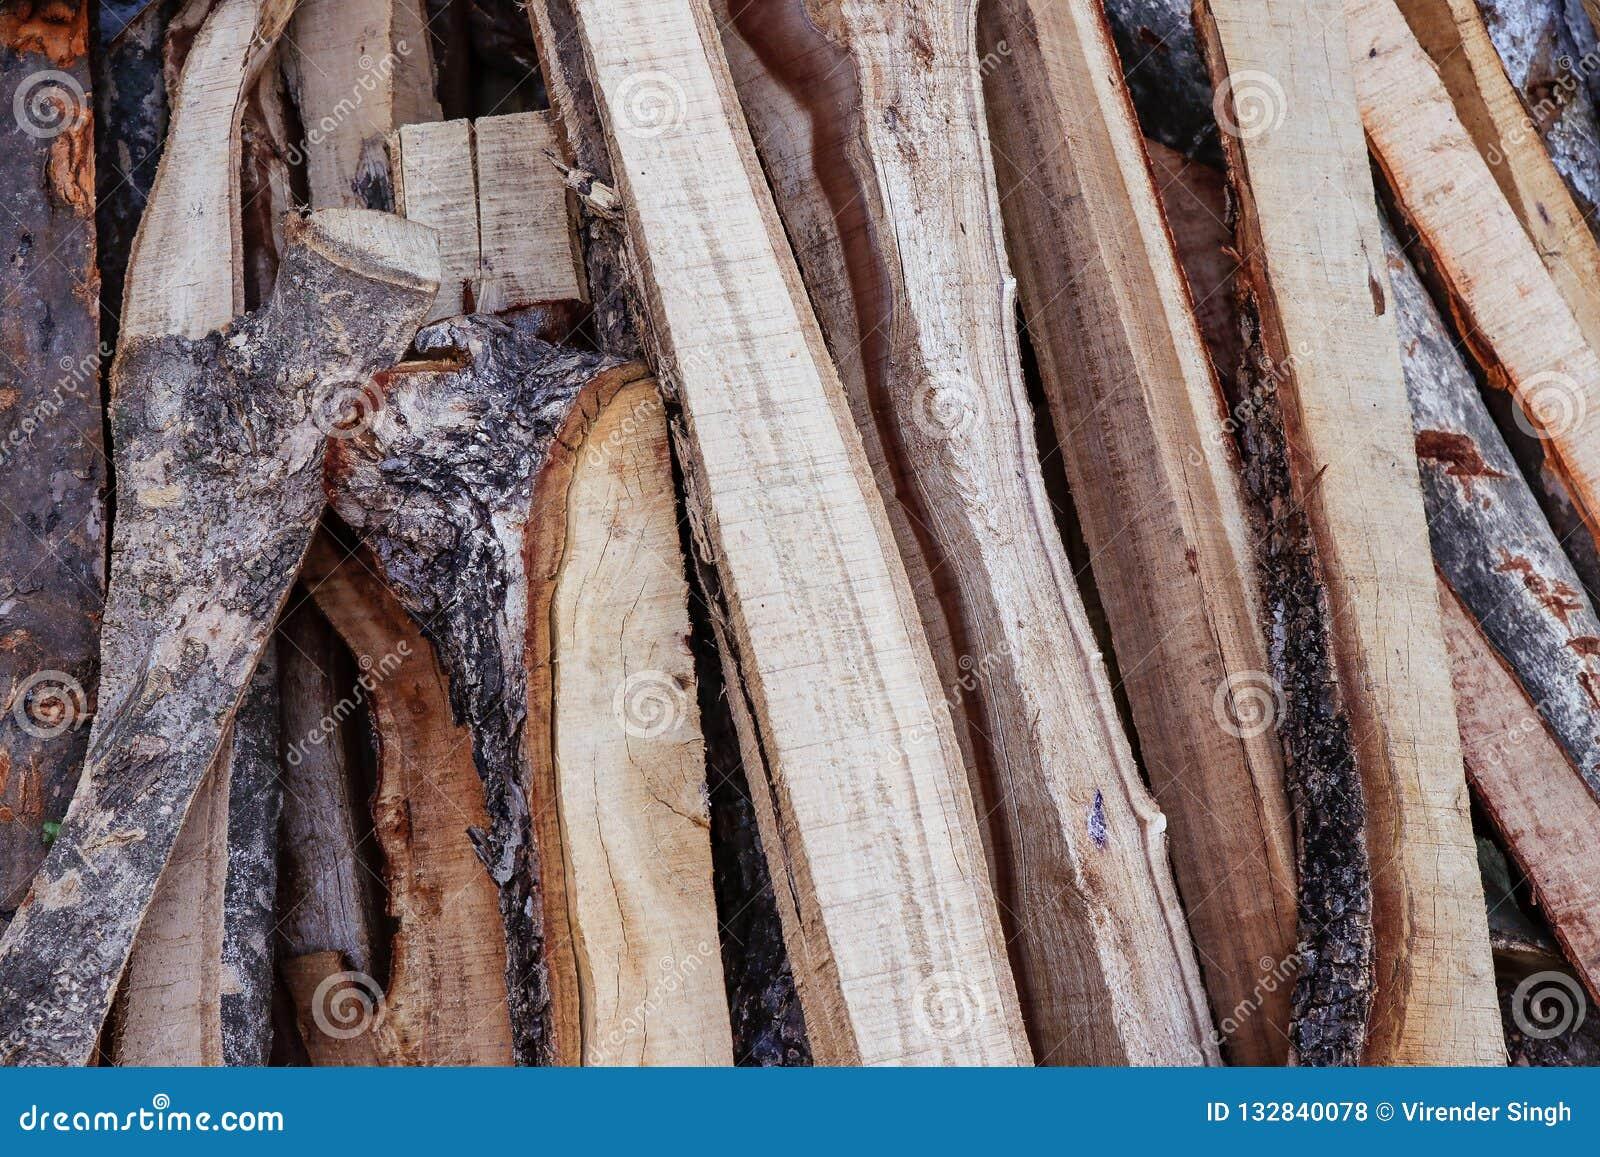 Gehackte, geschnittene Brennholzstücke